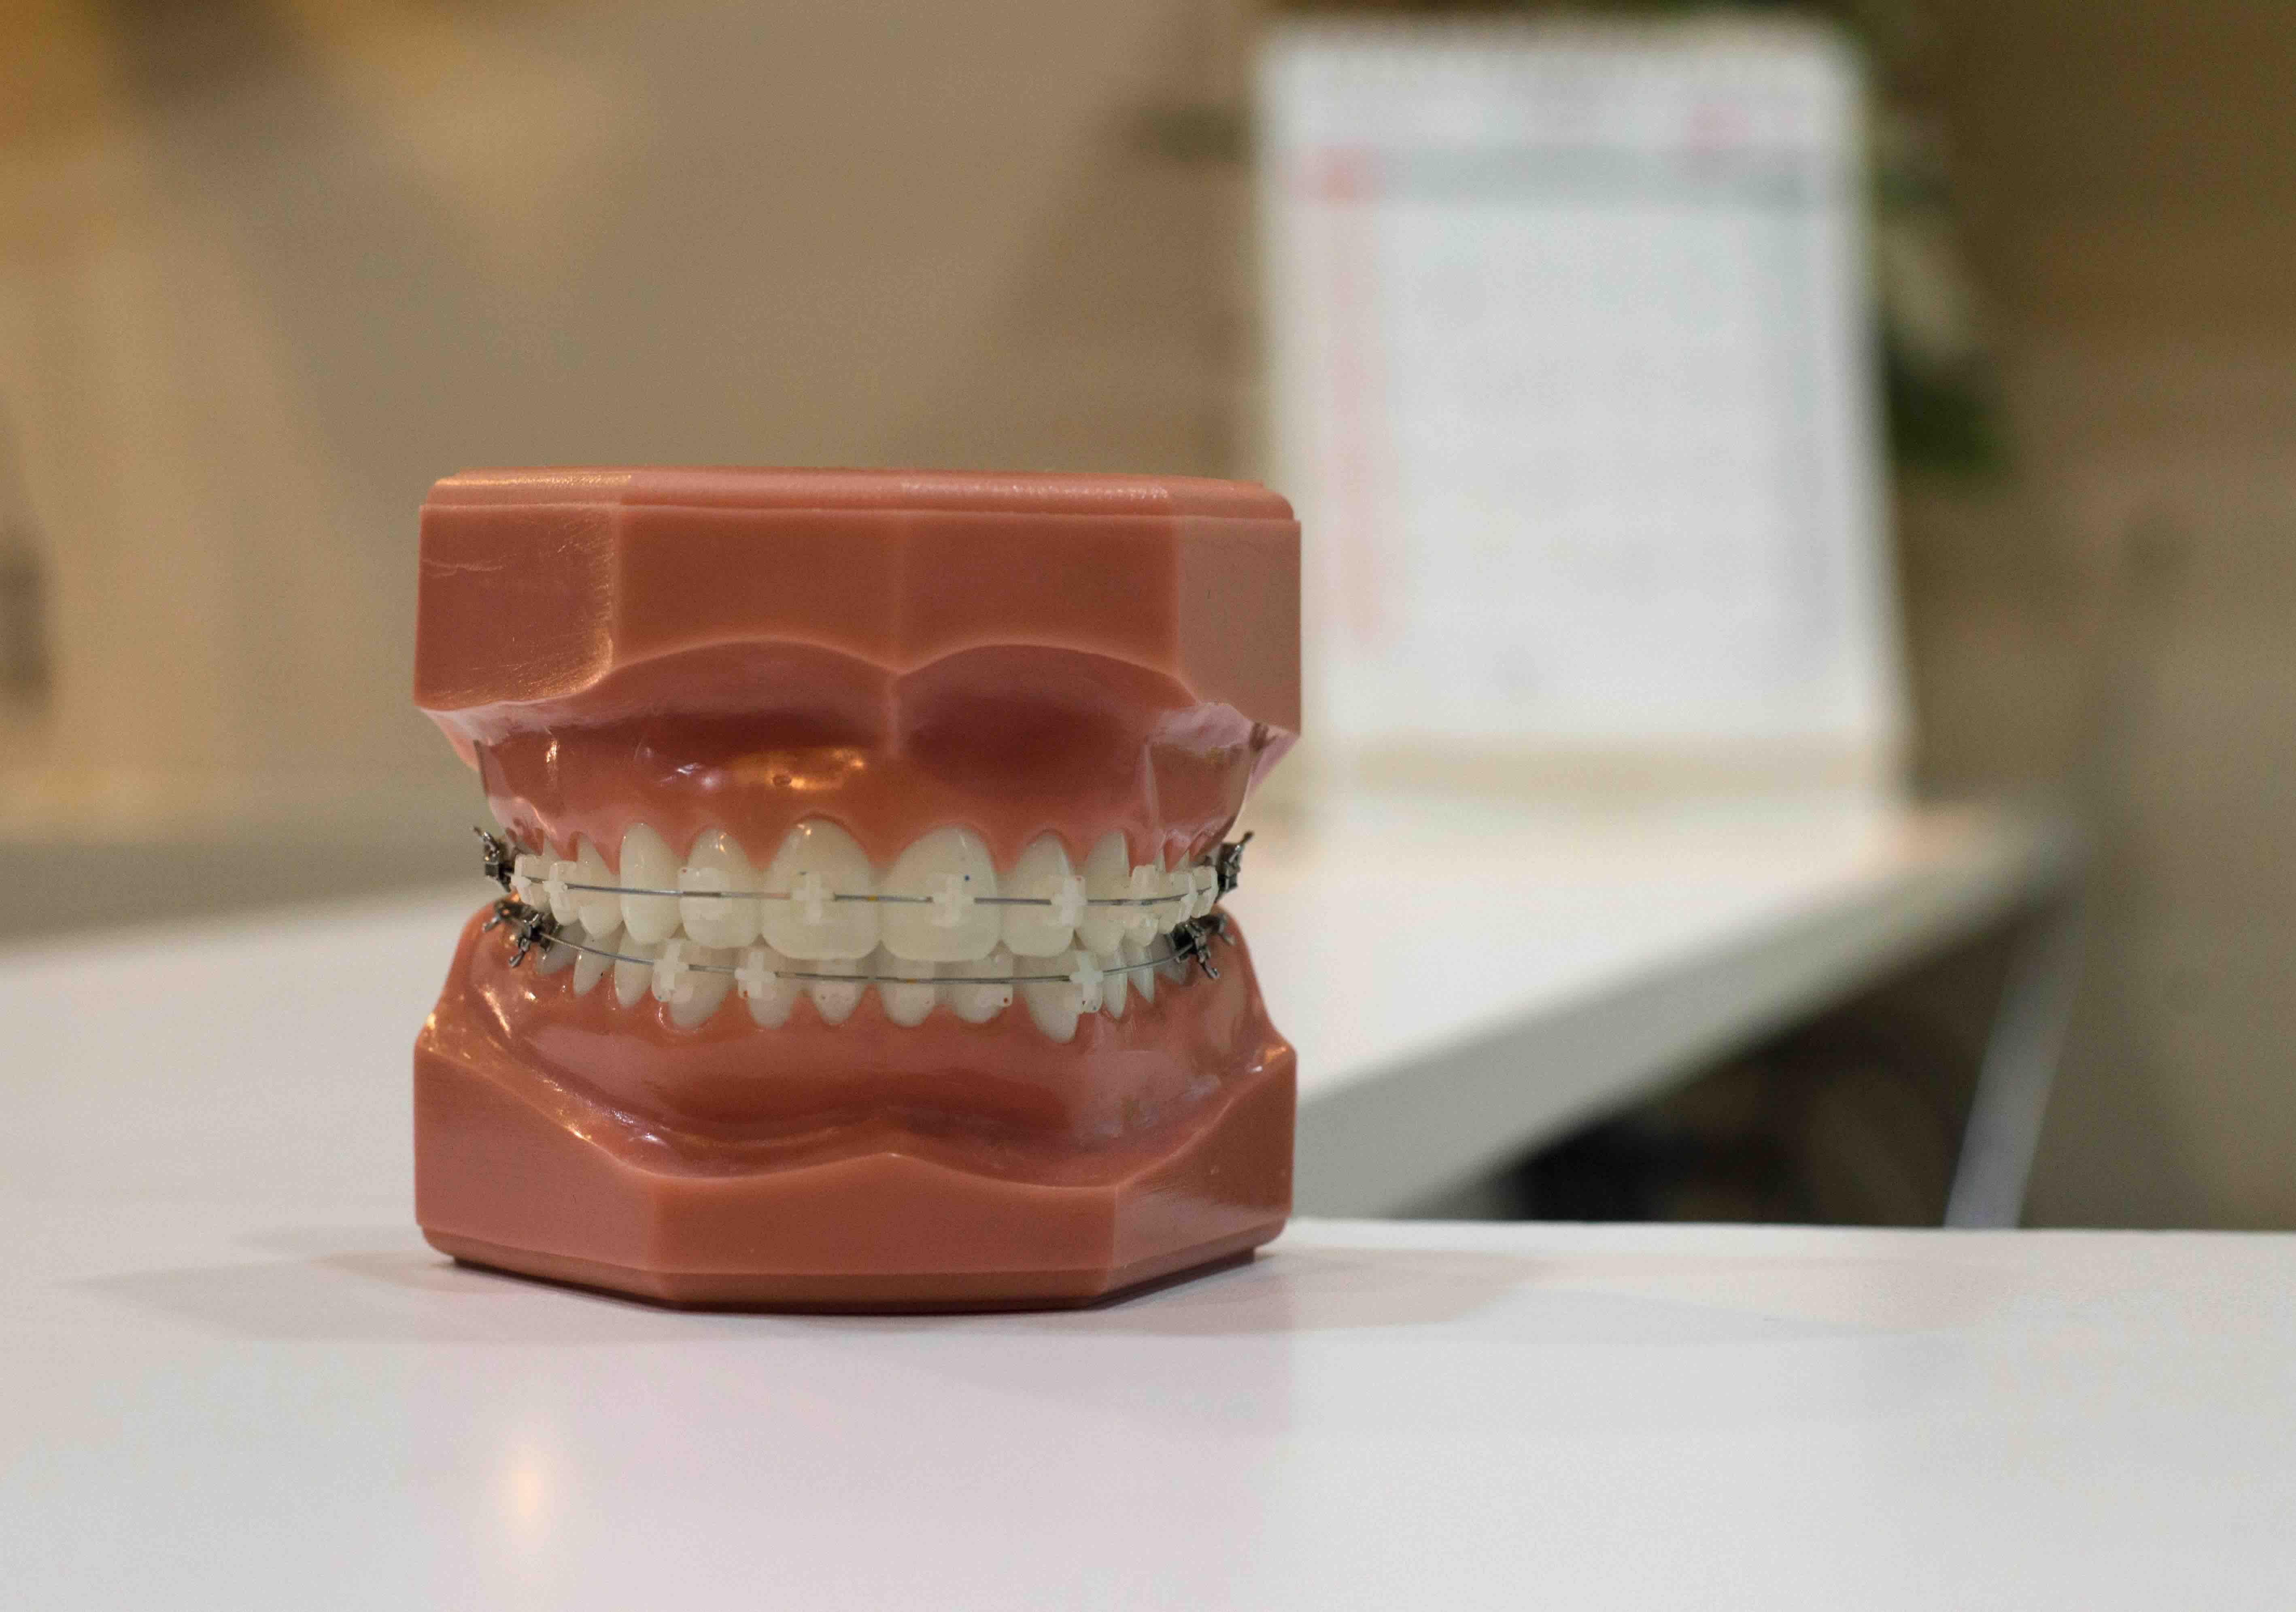 Should I get braces or Invisalign?